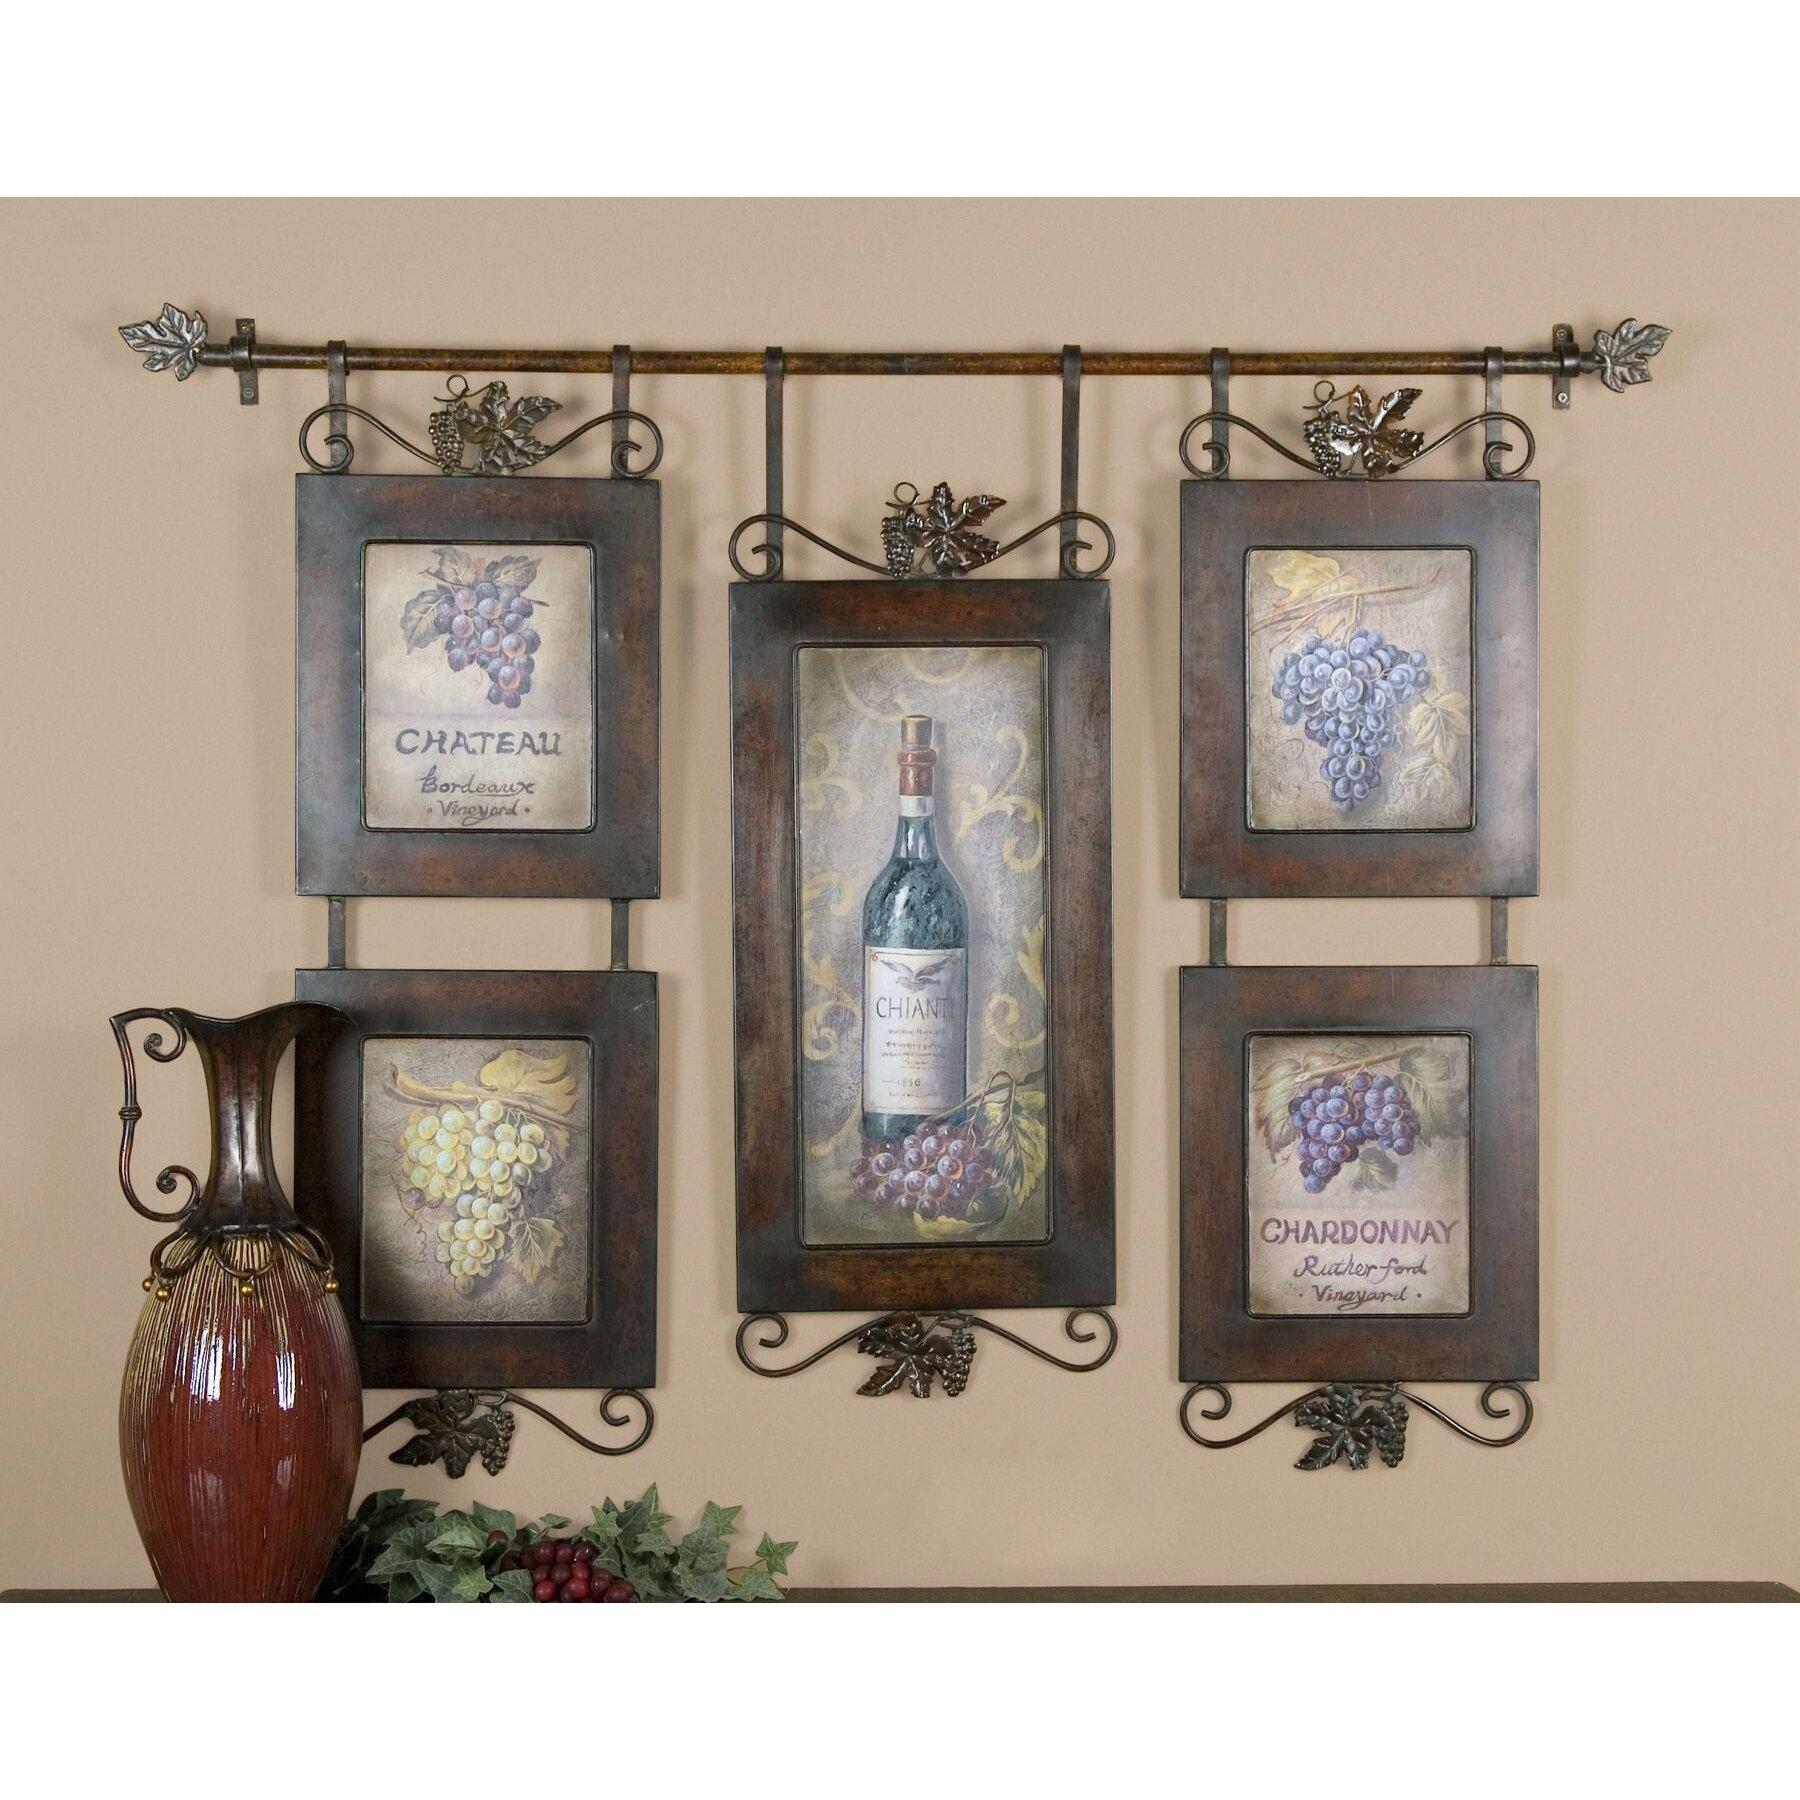 hanging wine wall dcor - Wine Wall Decor